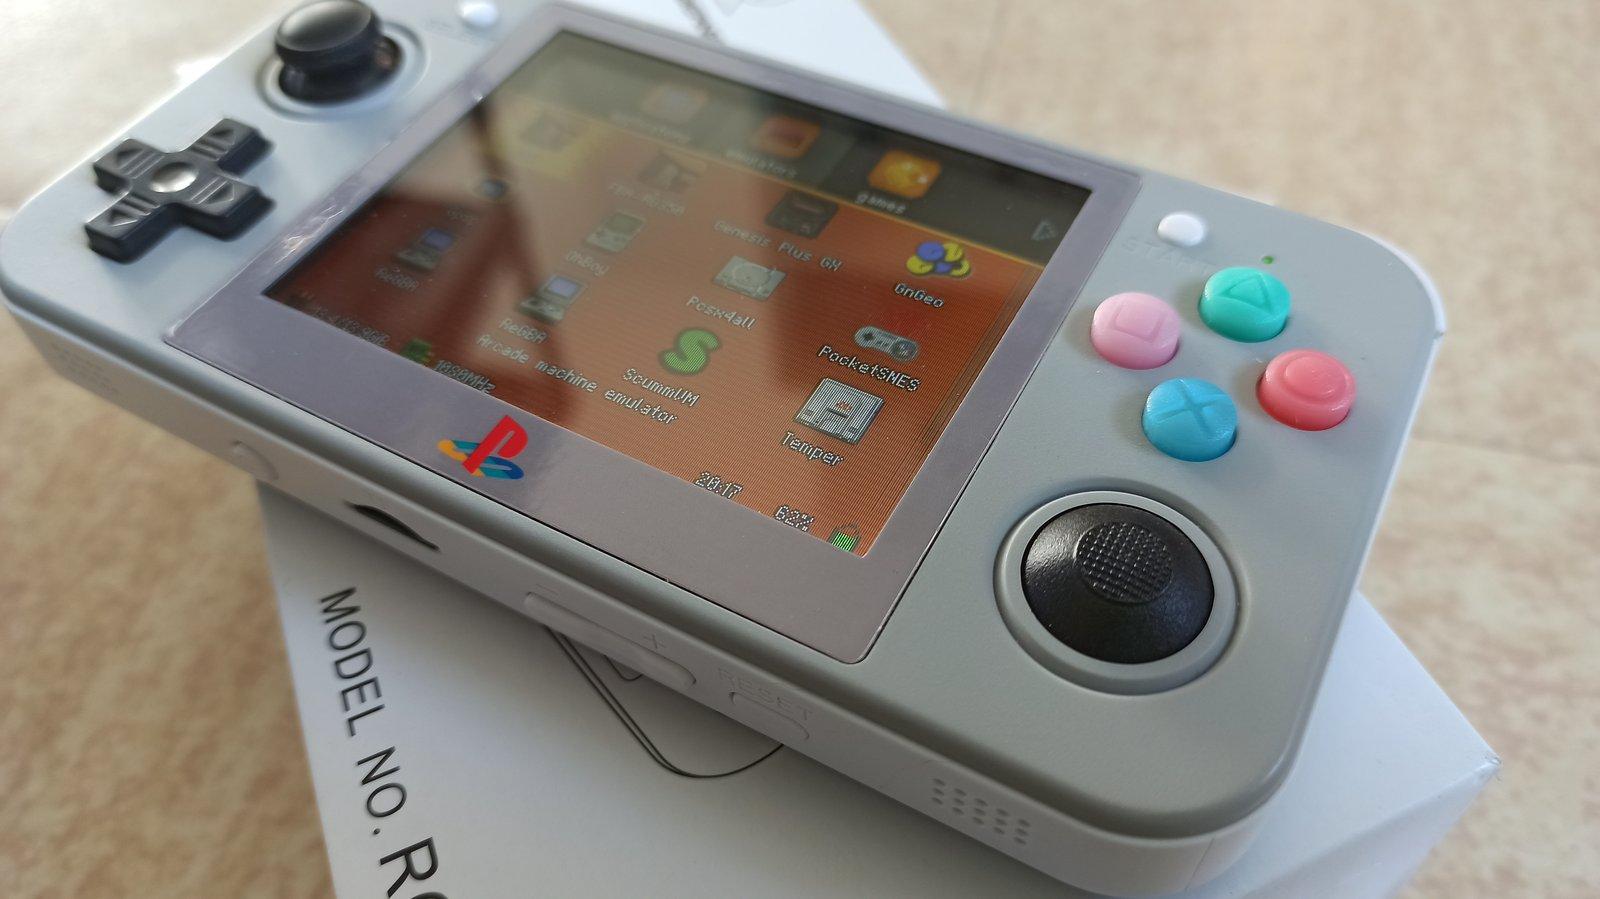 RG350 mod Sakura / Retroid Pocket 2  210110052426257758